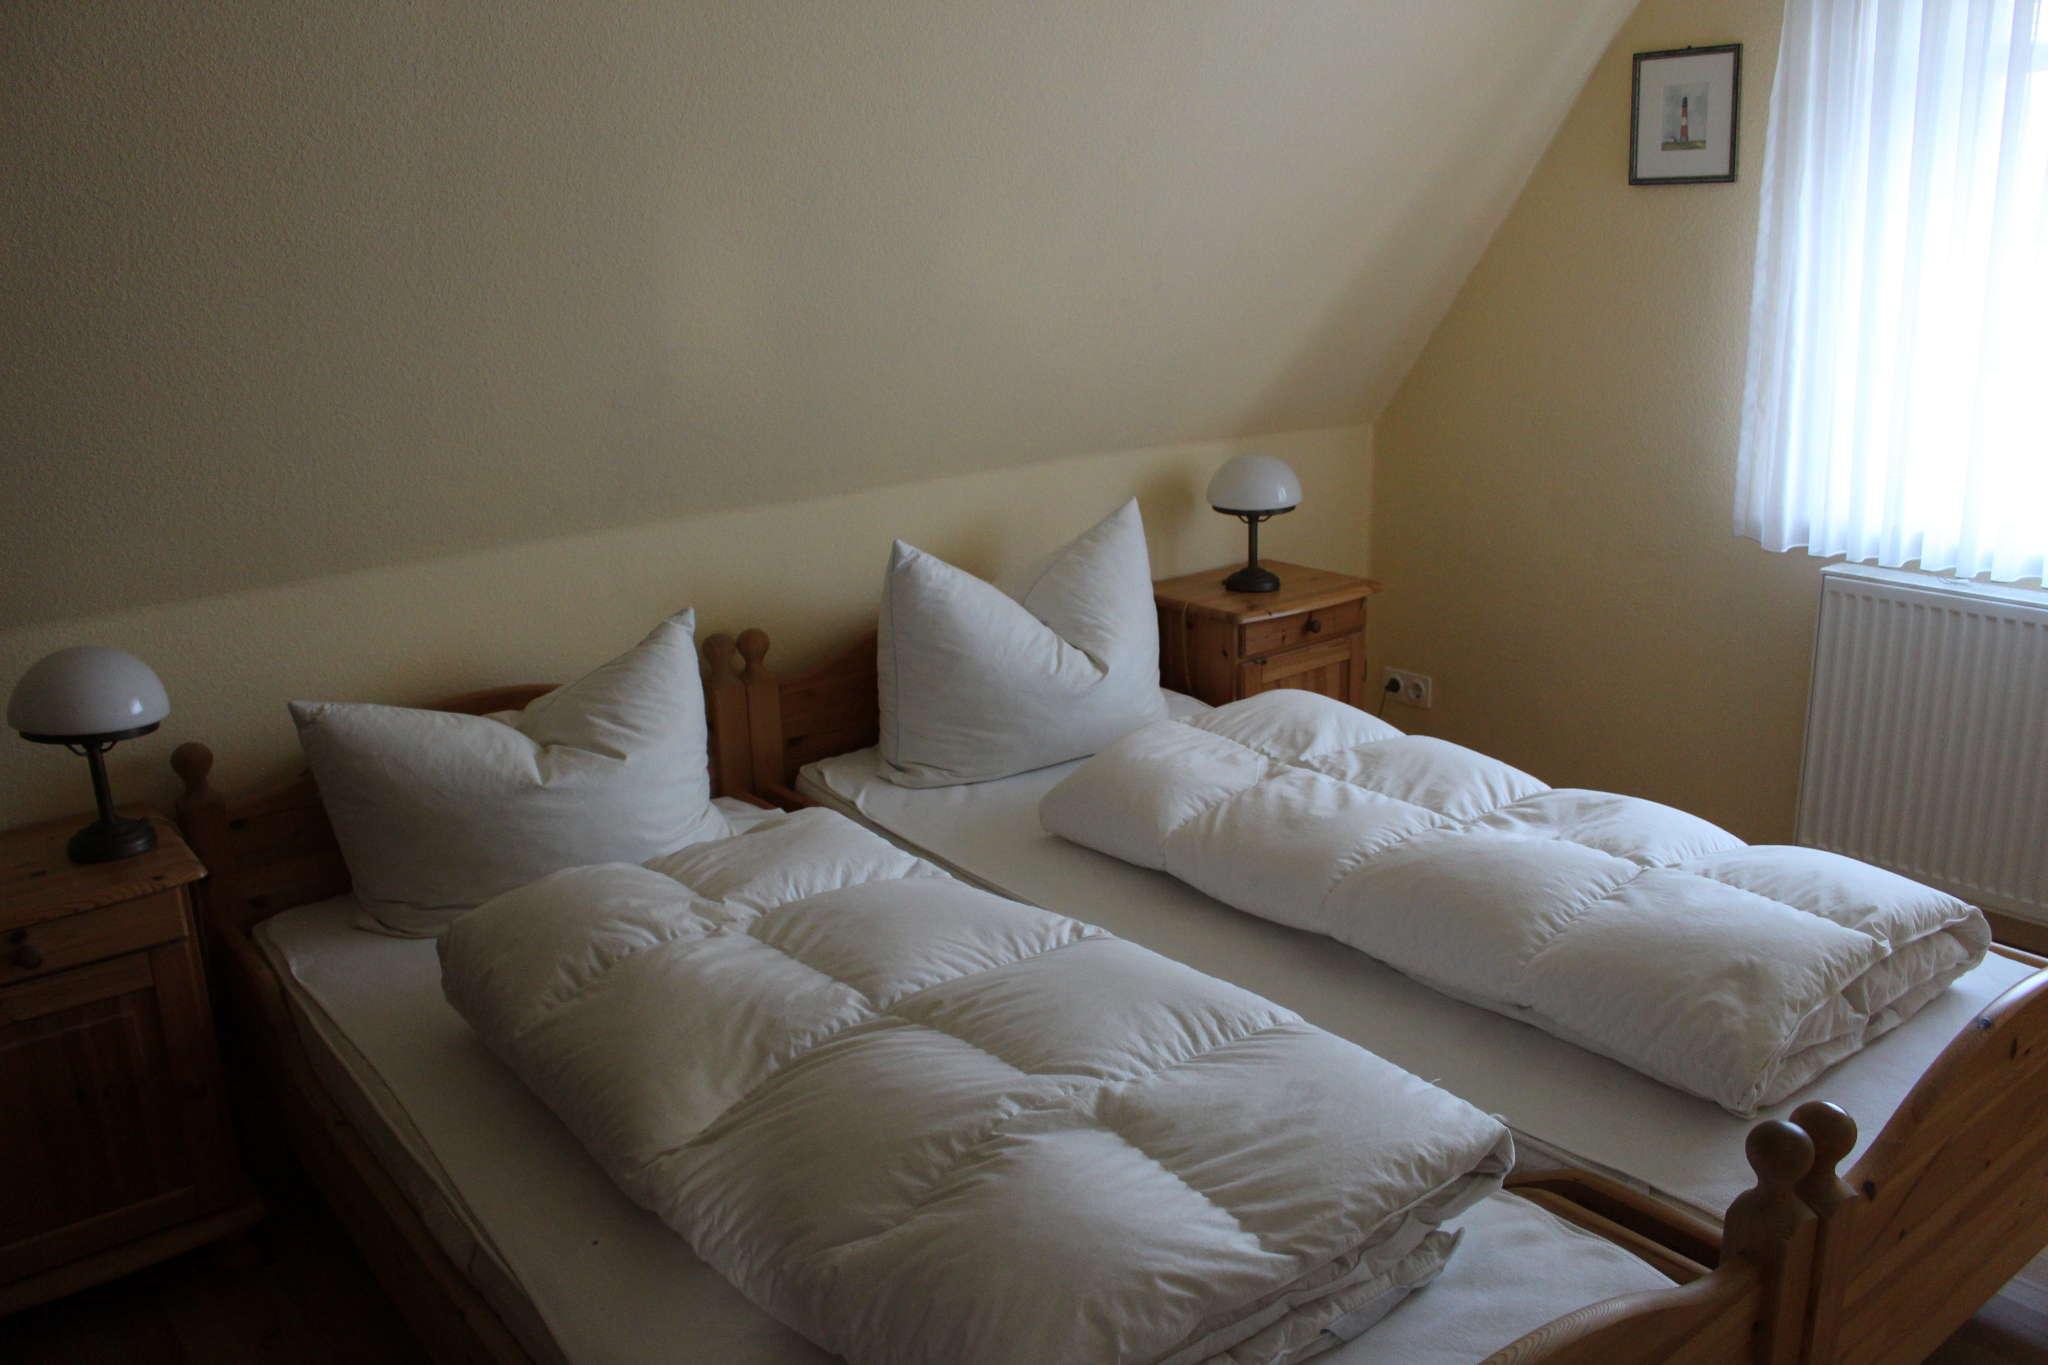 Schlafatelier/ Doppelbett